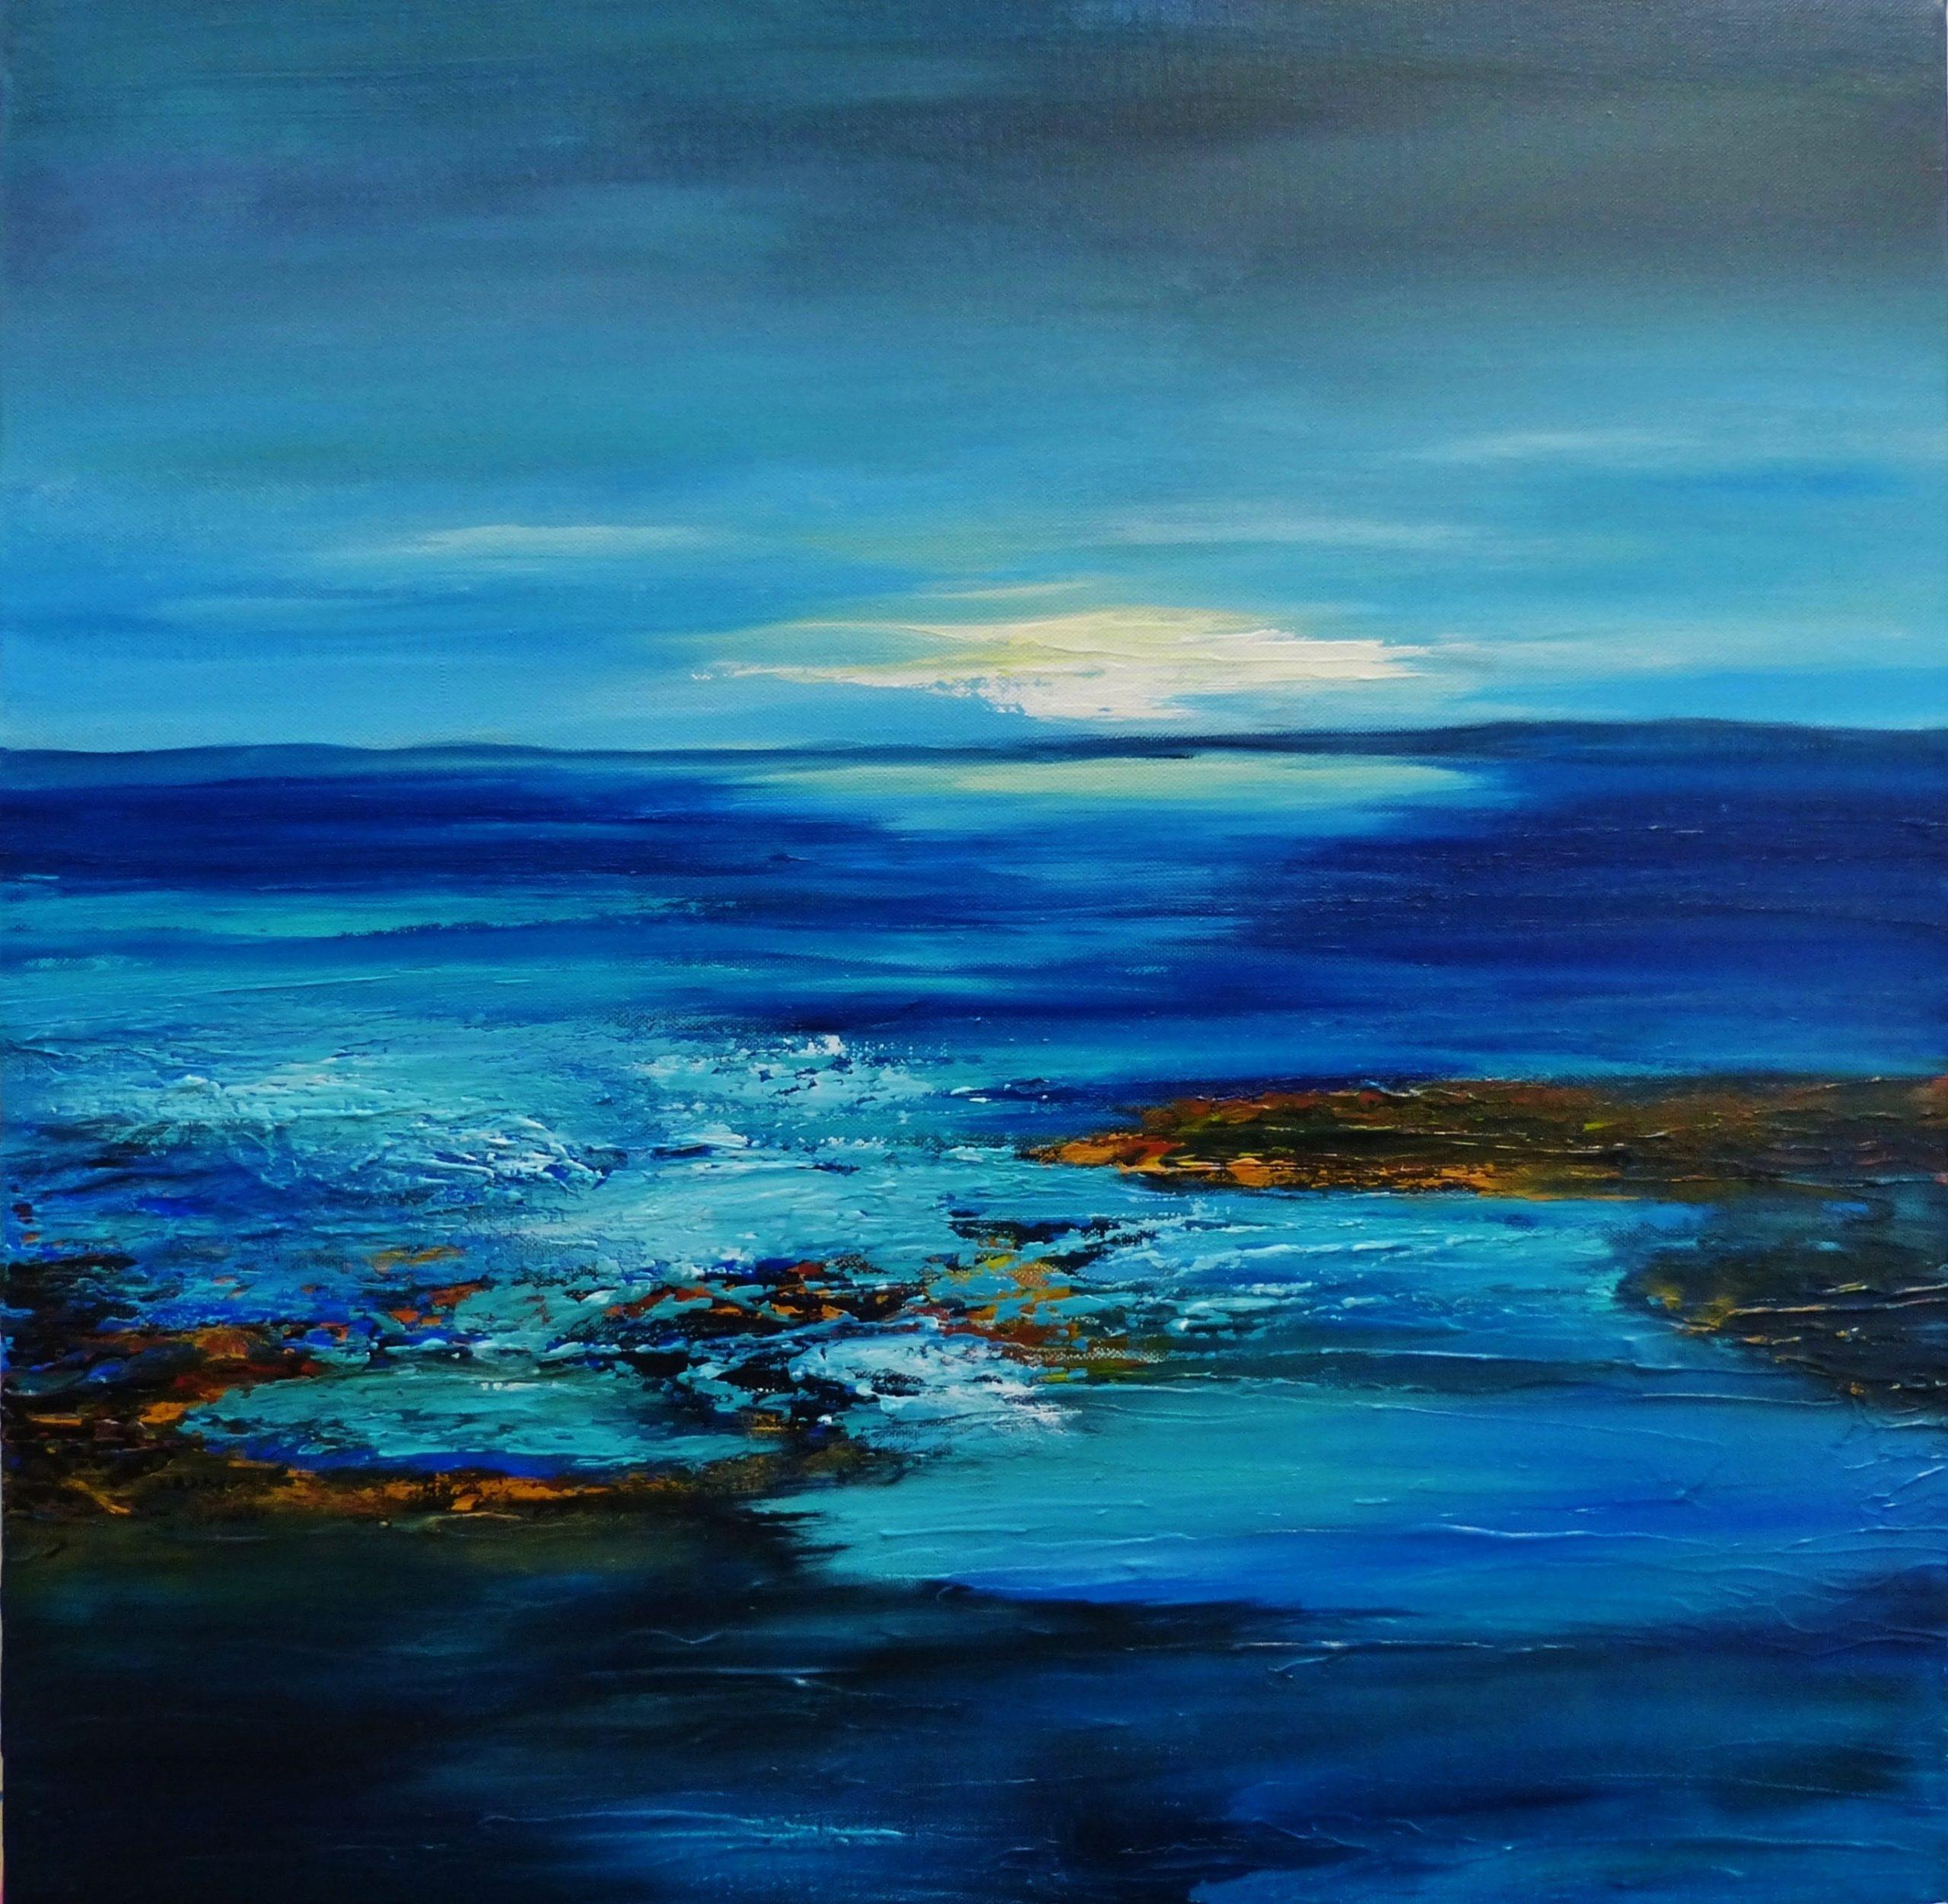 Light Before the Storm, Clare Riddington Jones - Copy